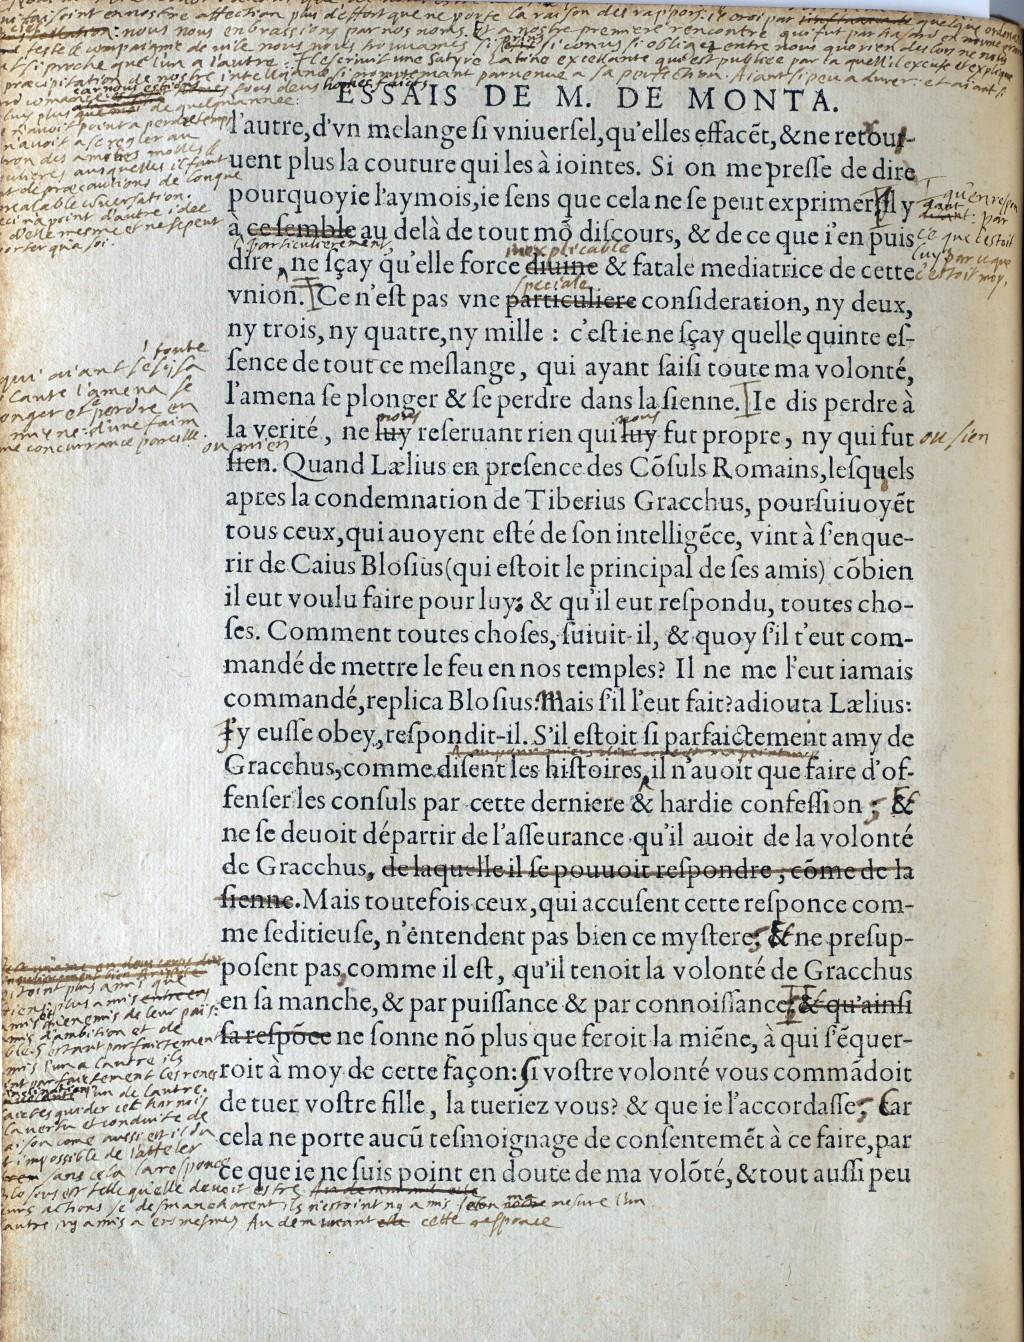 017 Montaigne Essais Manuscript Essays Summary Essay Astounding On Experience Repentance Cannibals Large